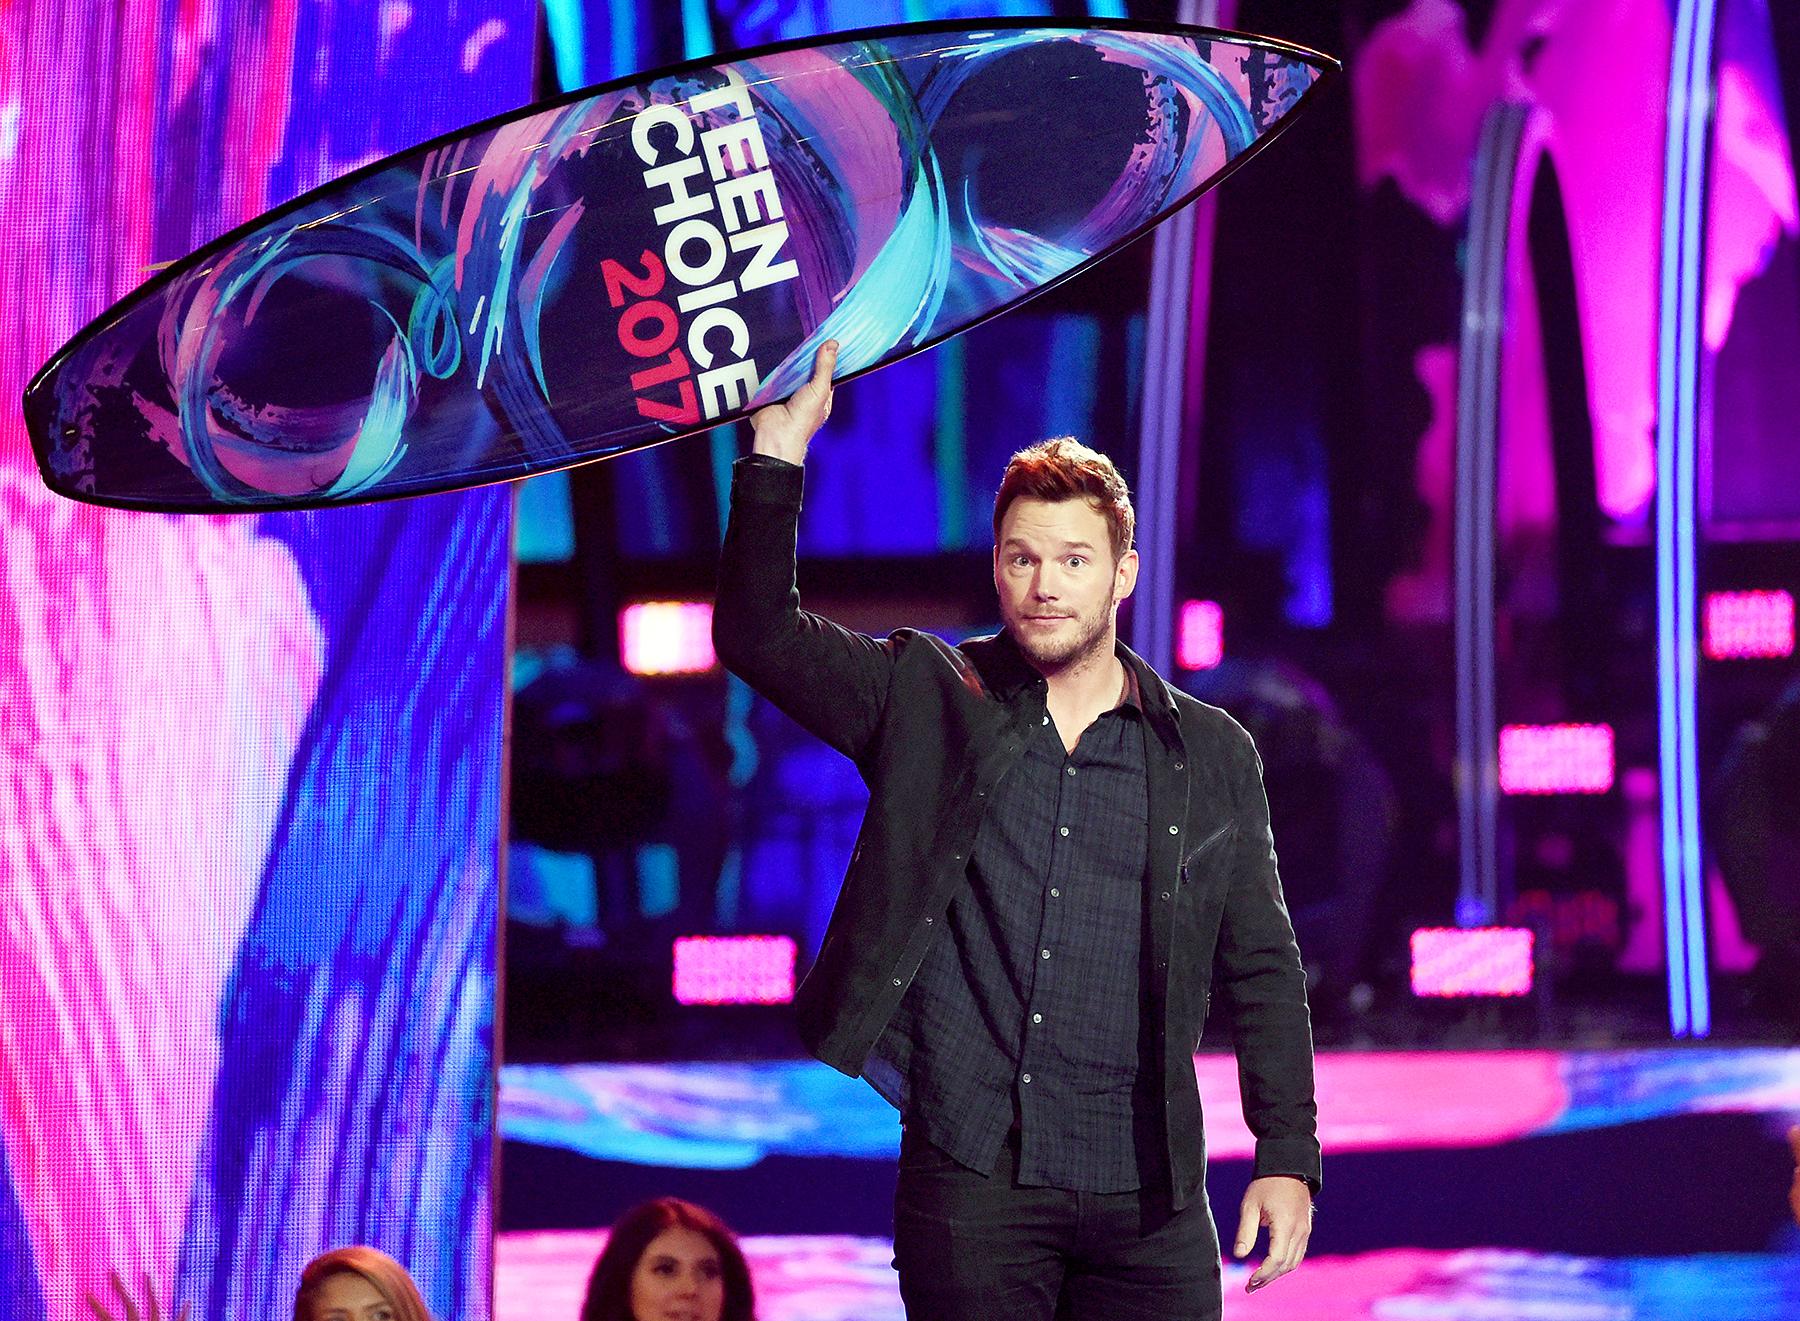 Chris Pratt Teen Choice Awards 2017